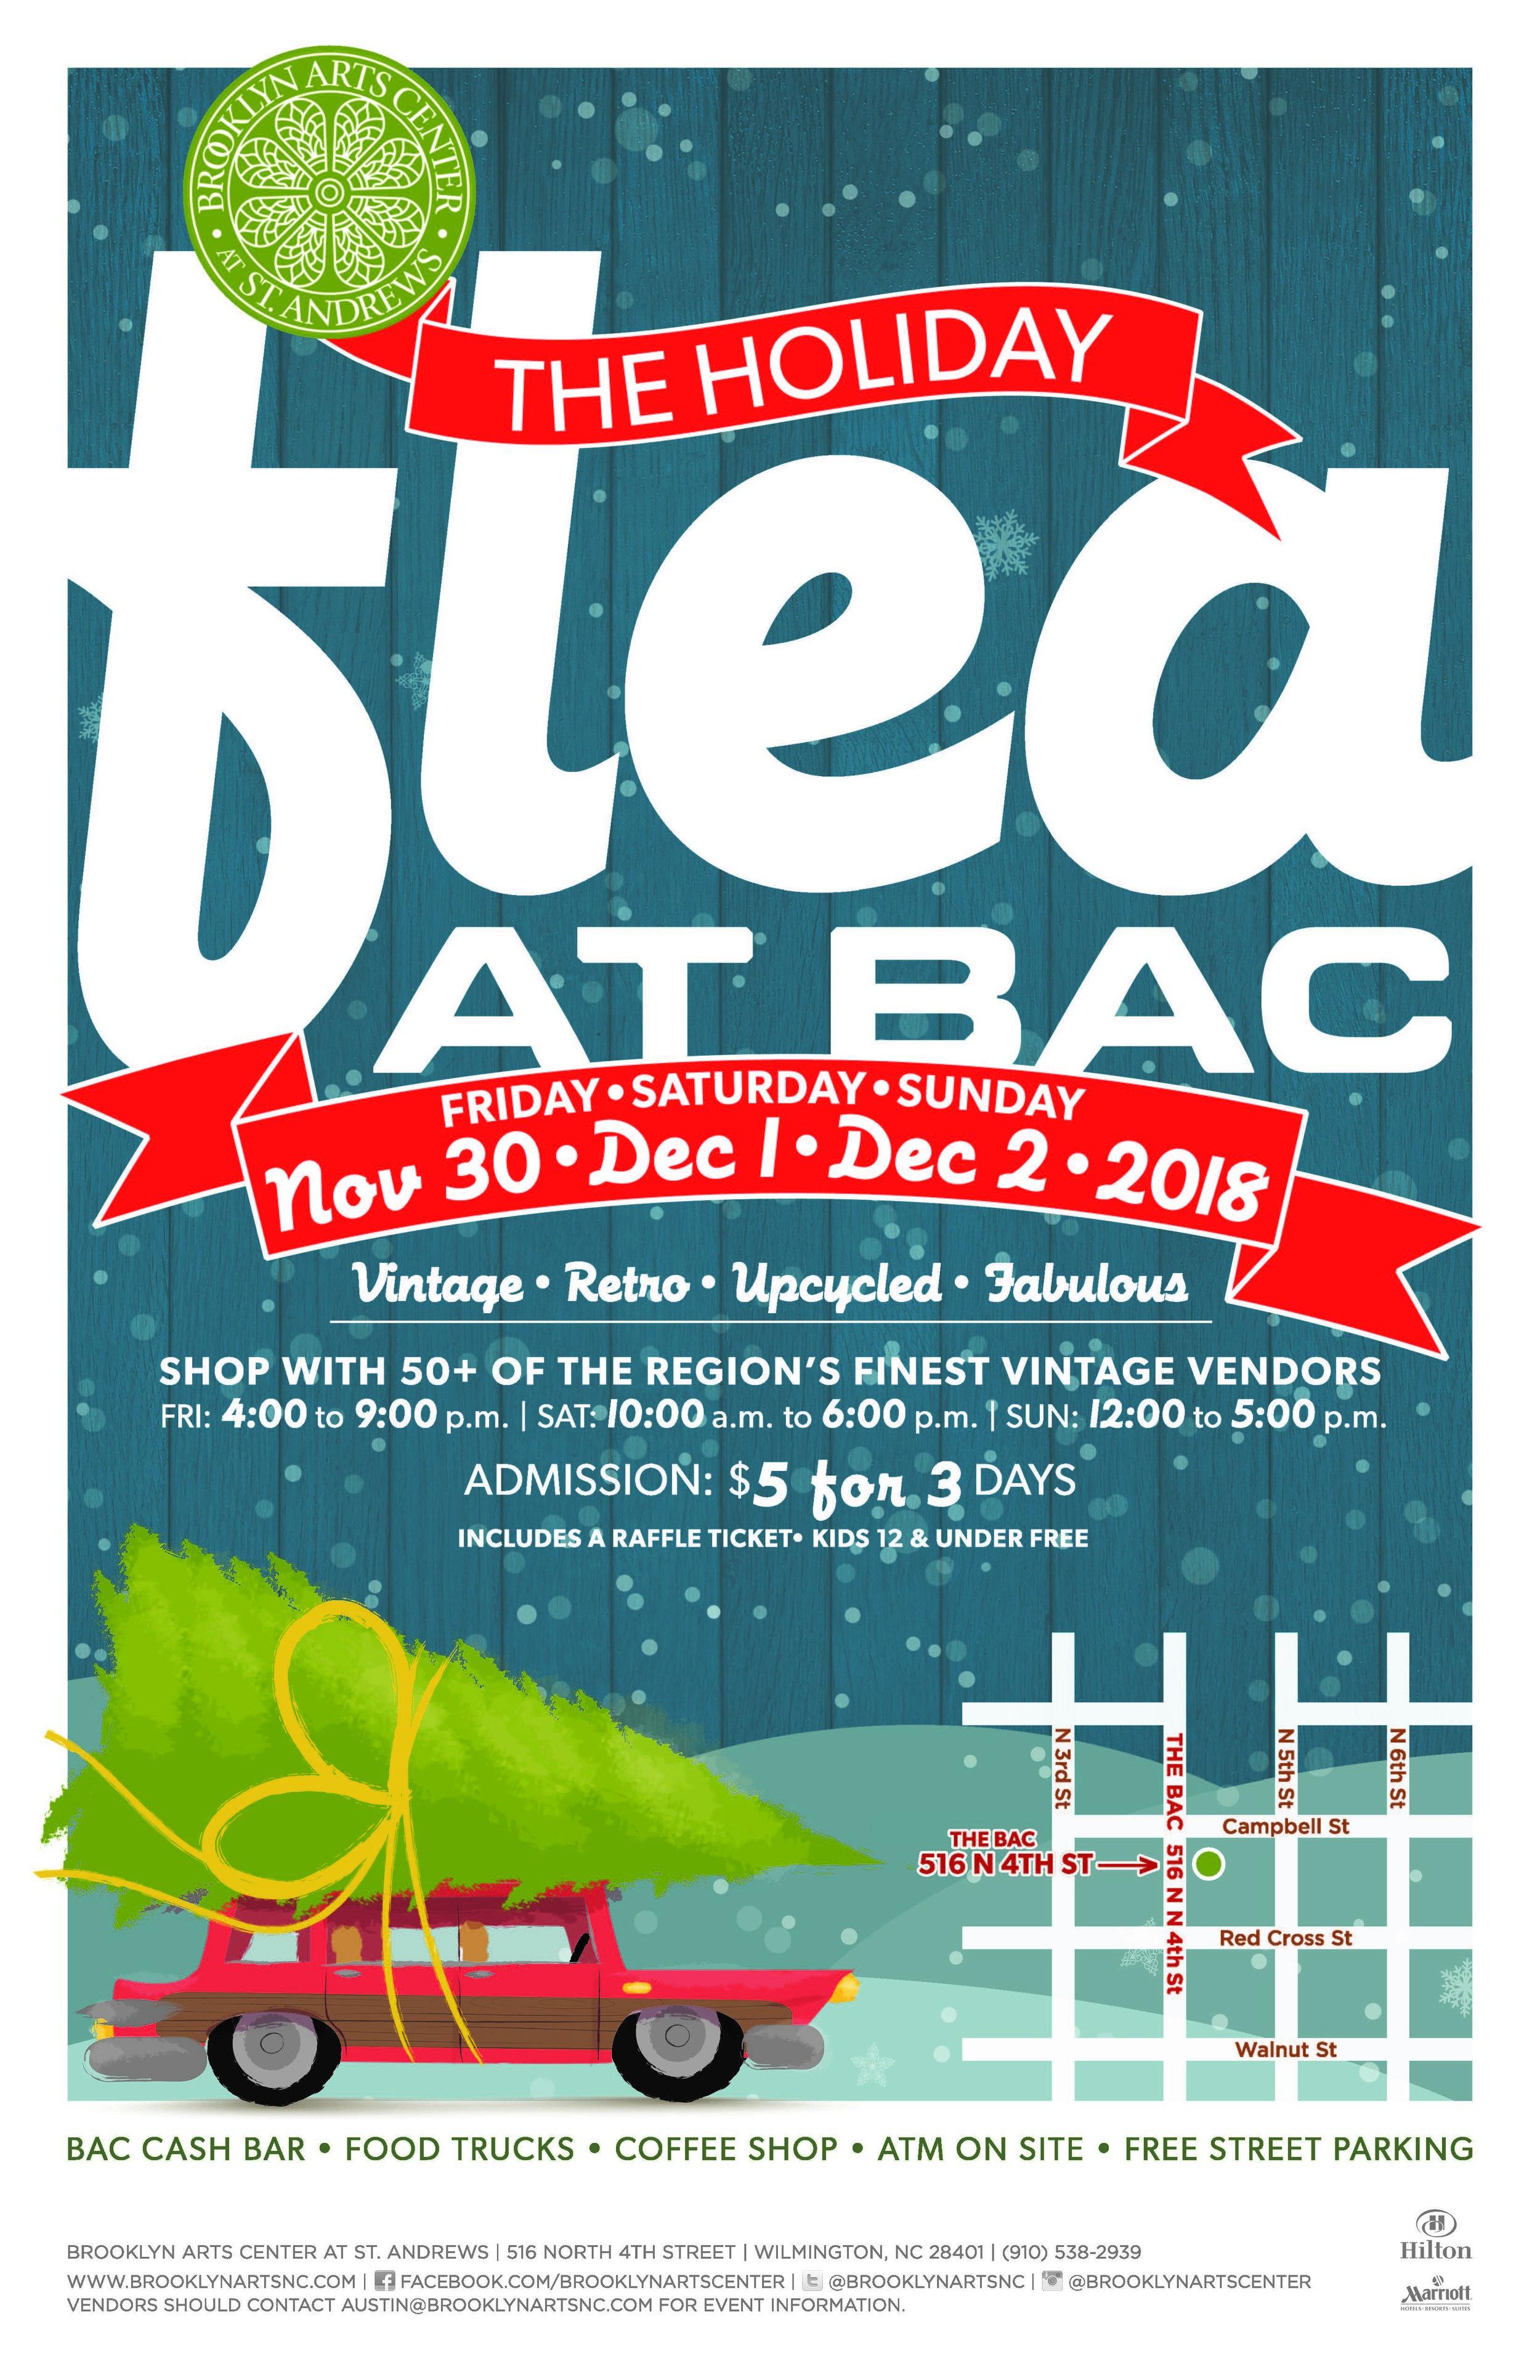 BAC_2062-holiday flea 2018-poster_r2.jpg